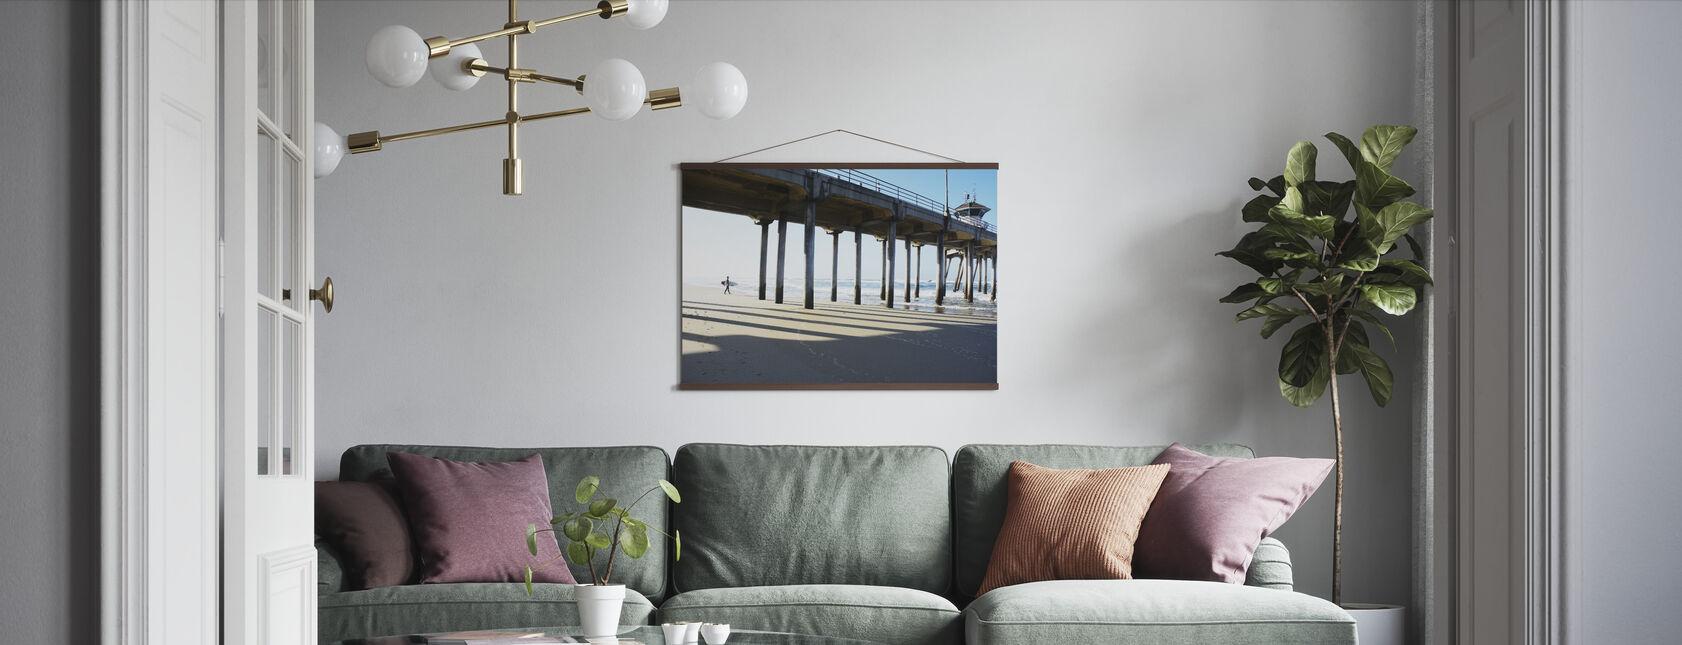 Surf City - Affiche - Salle à manger